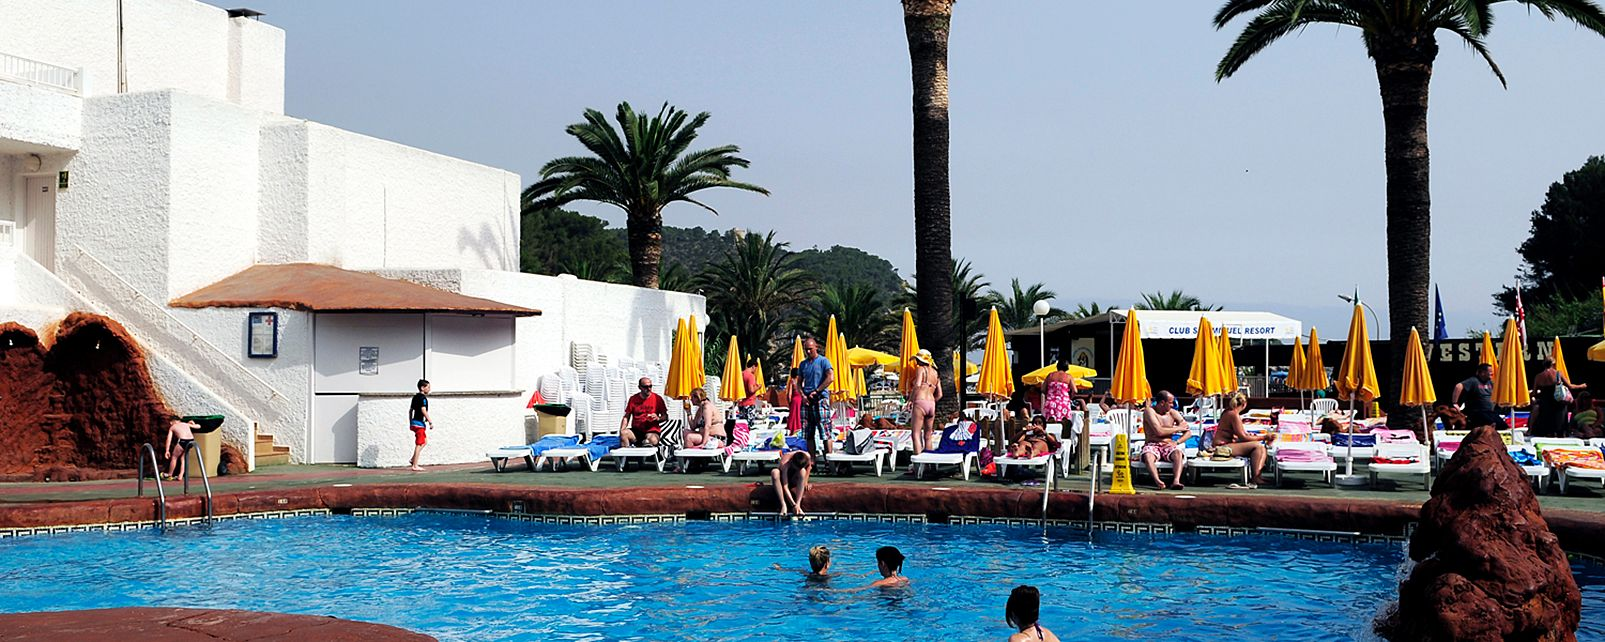 Hotel Club San Miguel